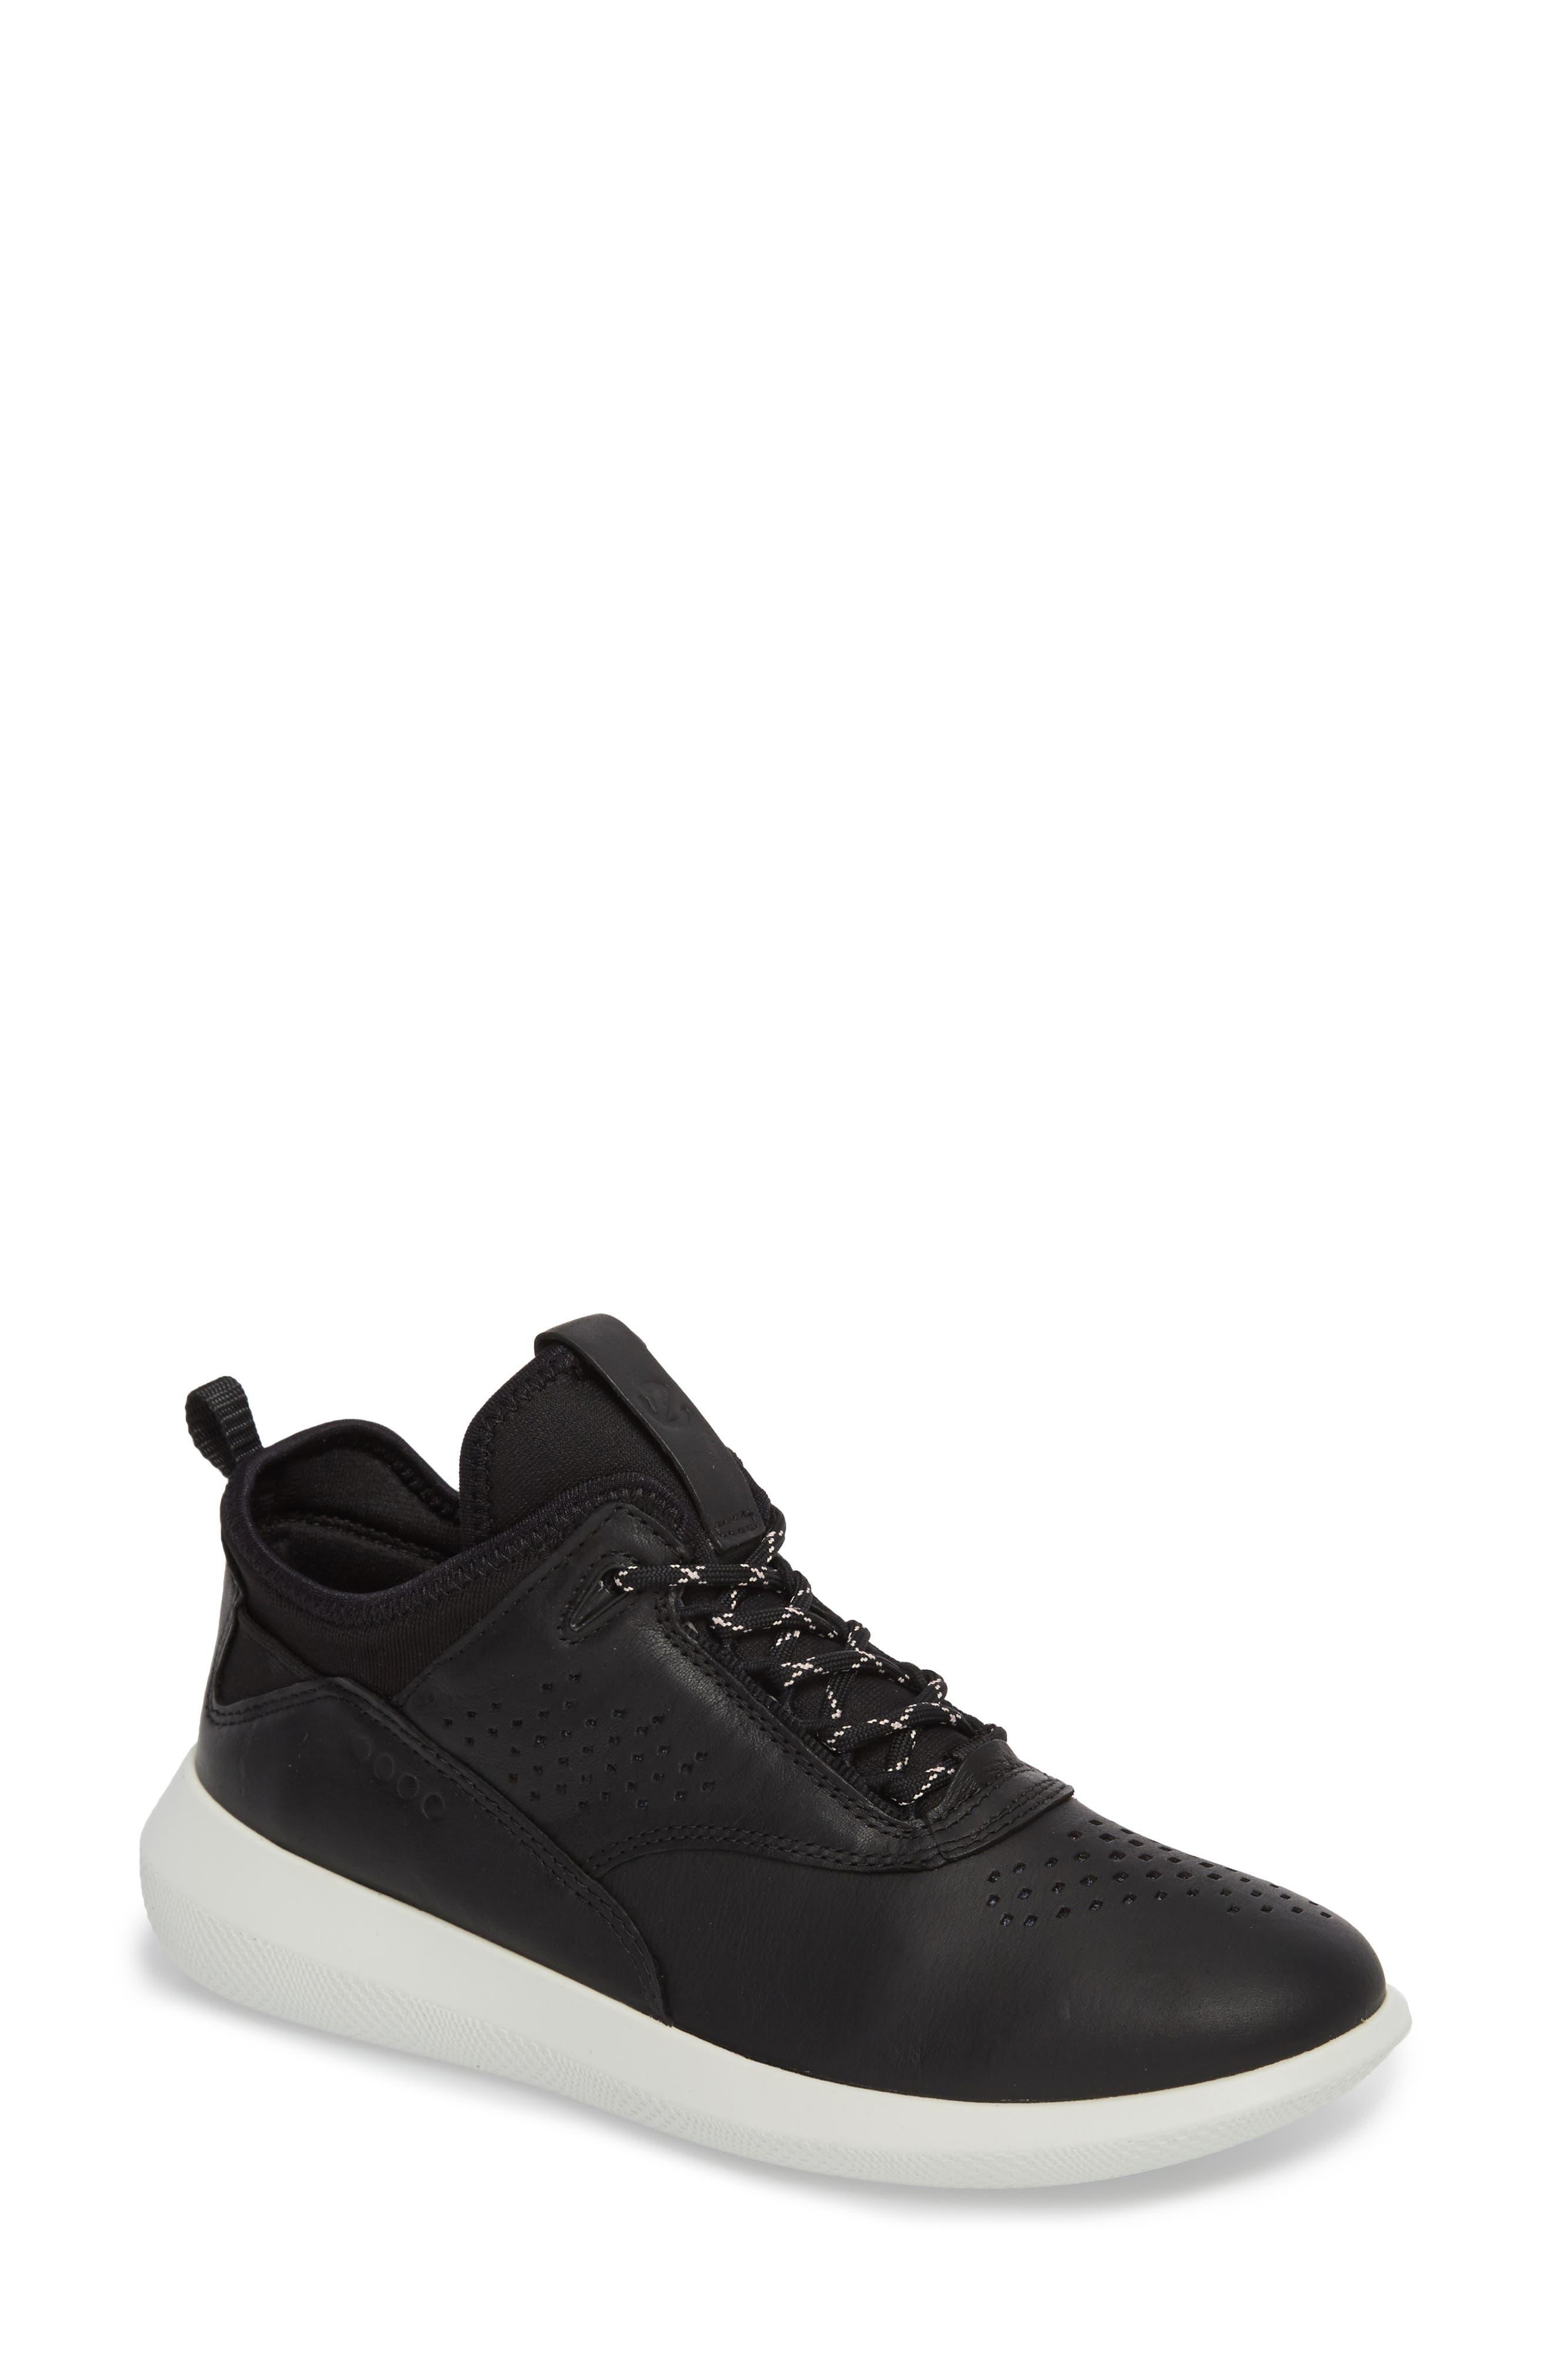 Scinapse Sneaker,                         Main,                         color, BLACK LEATHER